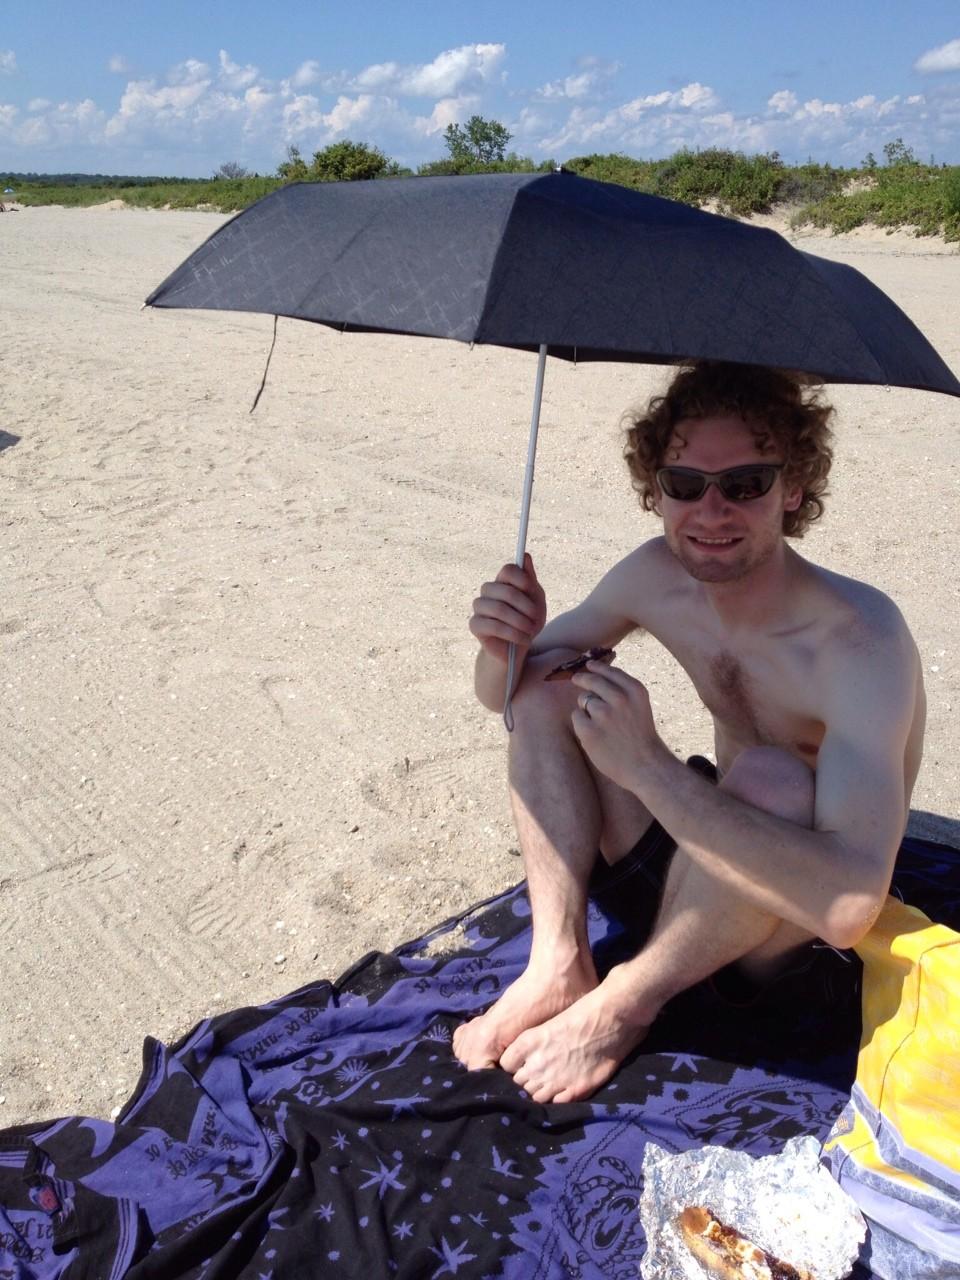 Photo of Big Mr. demonstrating the original use of the umbrella